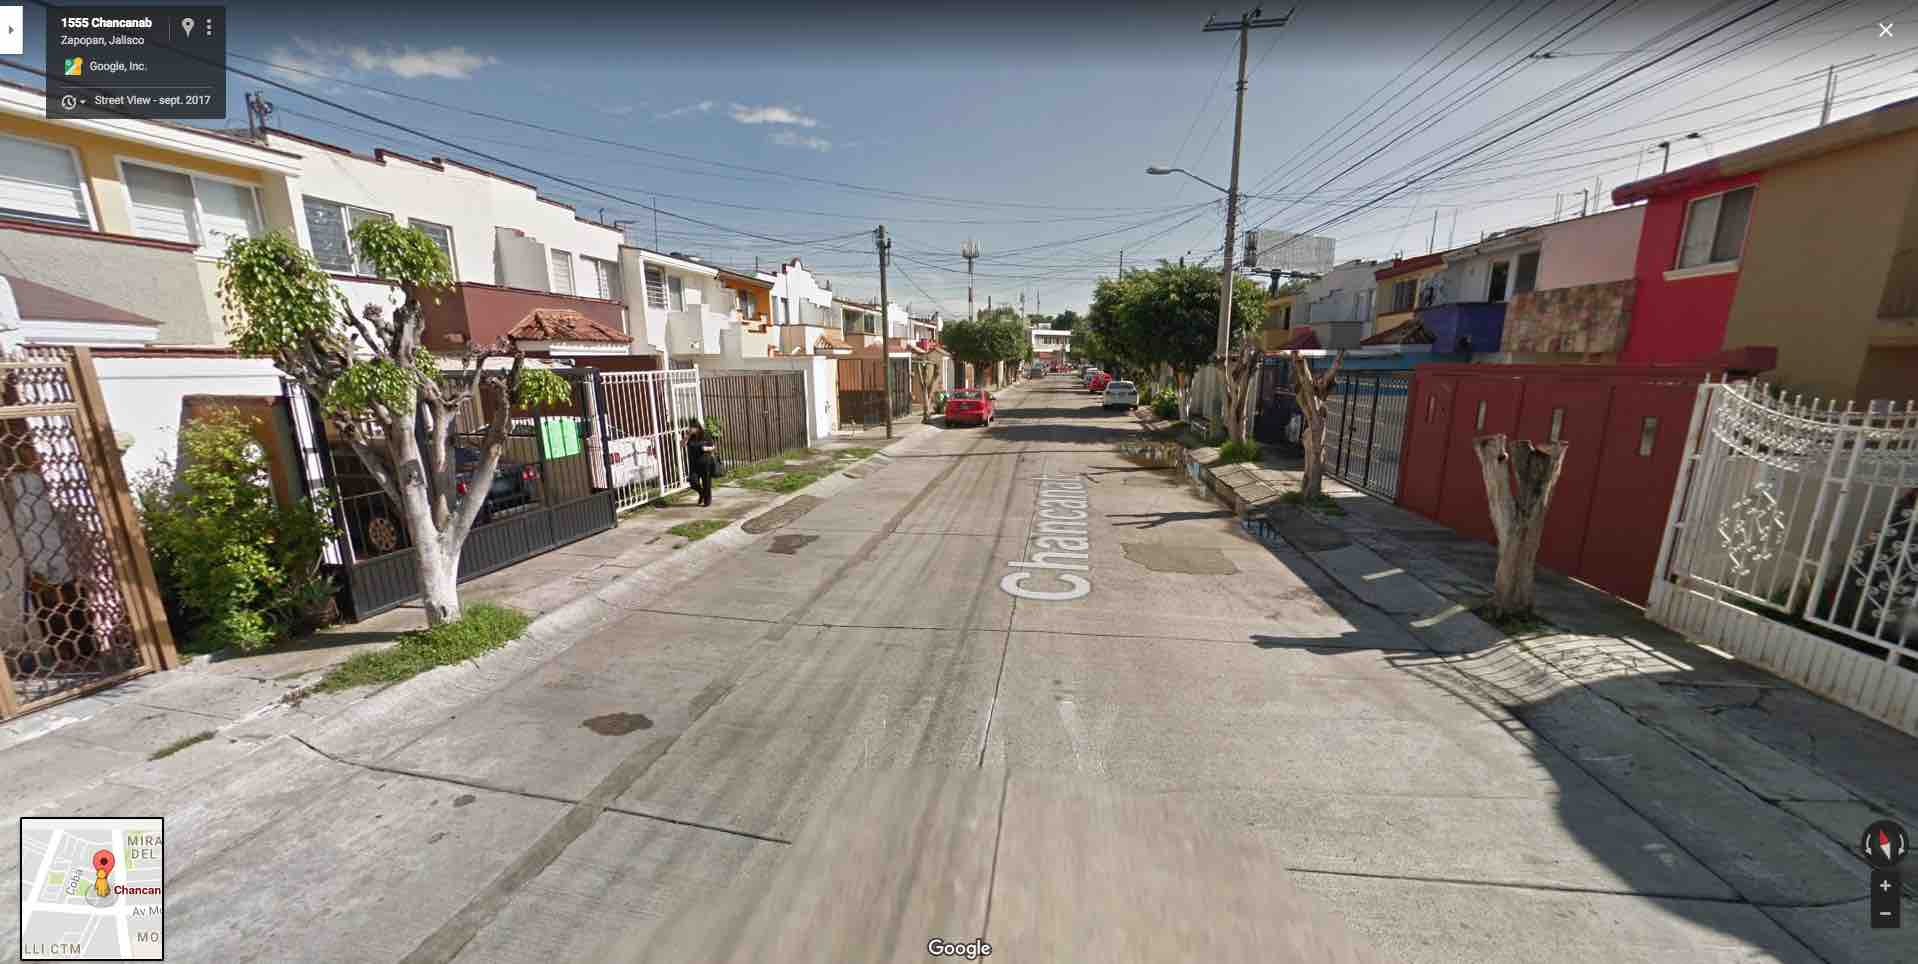 Fracc. Santa Catalina, Calle Chancanab 1547, Zapopan, Jal.